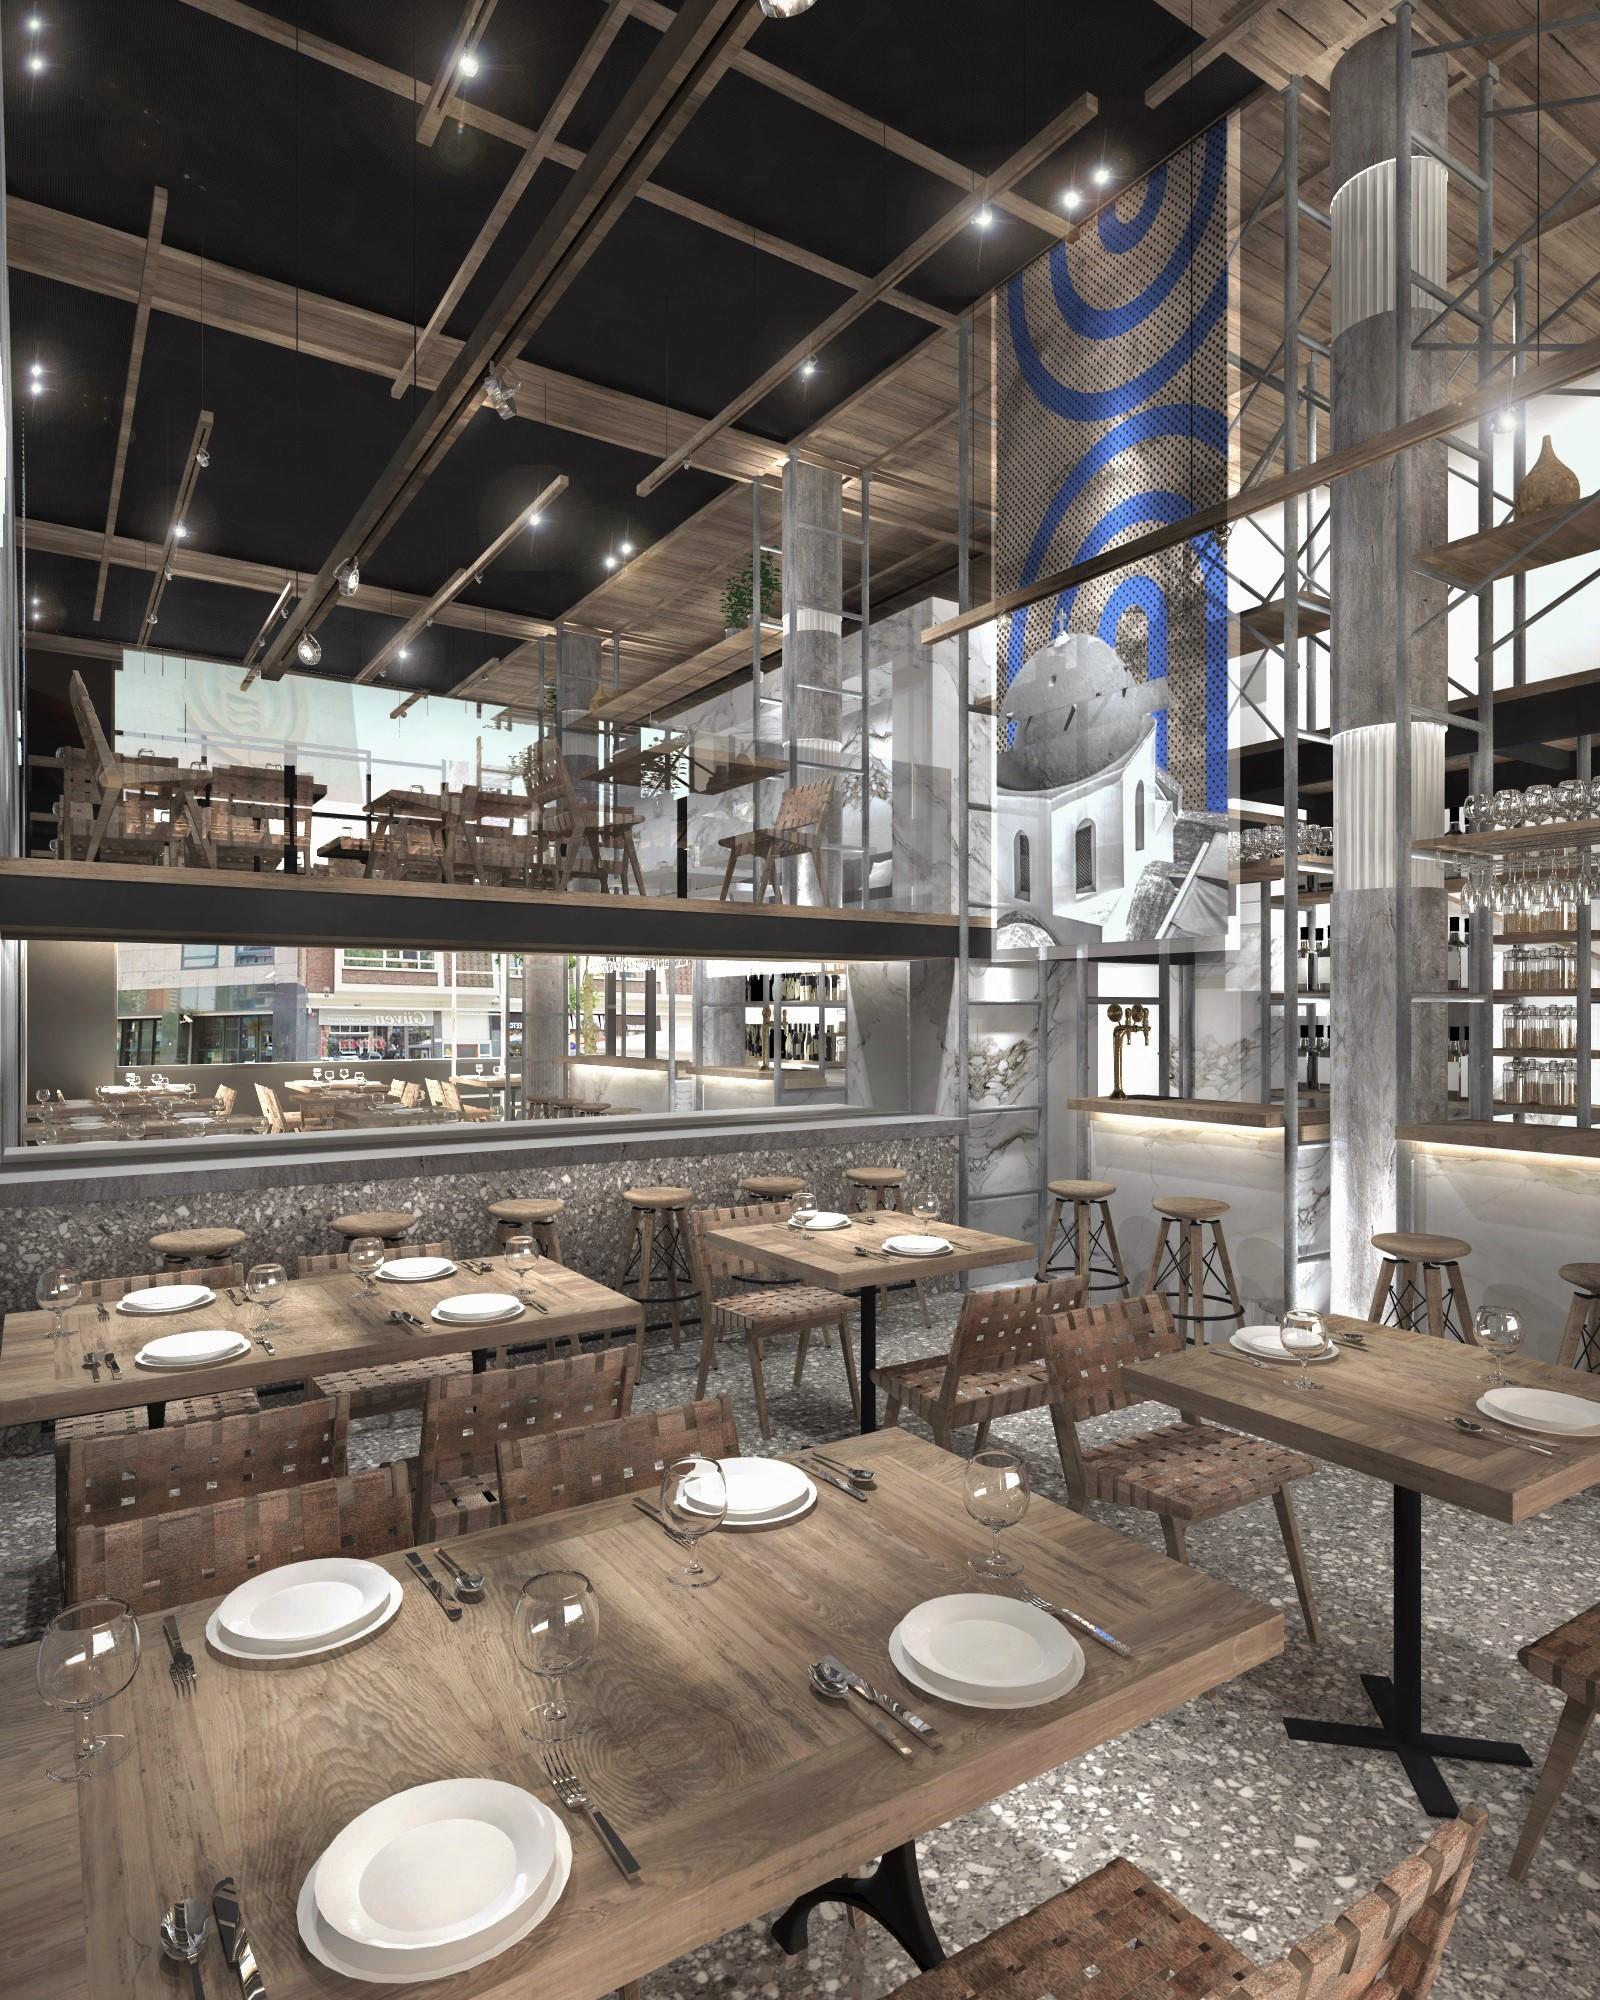 Olympia kitchen bar Rotterdam, Netherlands